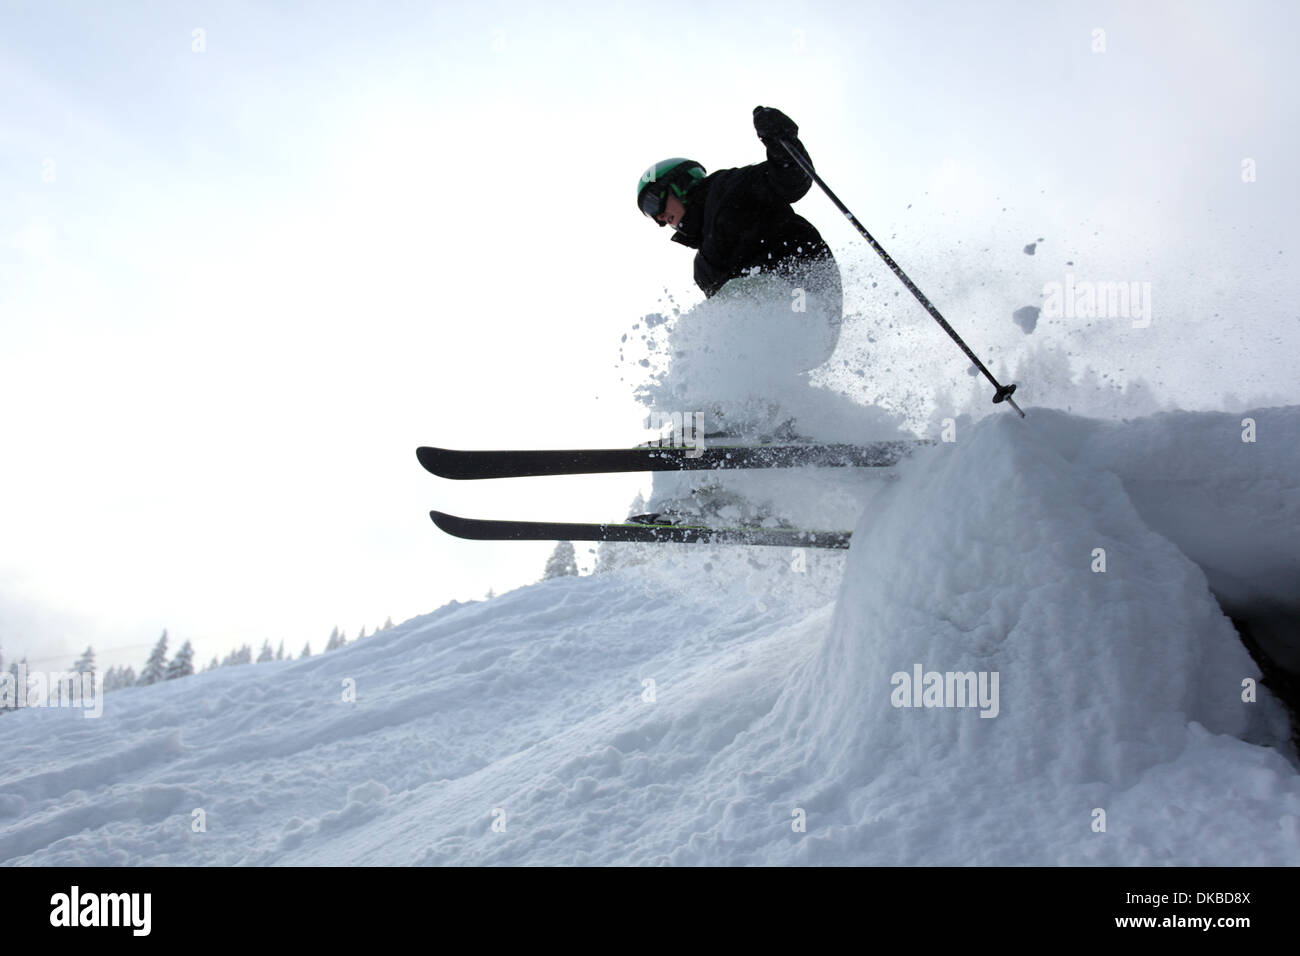 Skier jumping - Stock Image